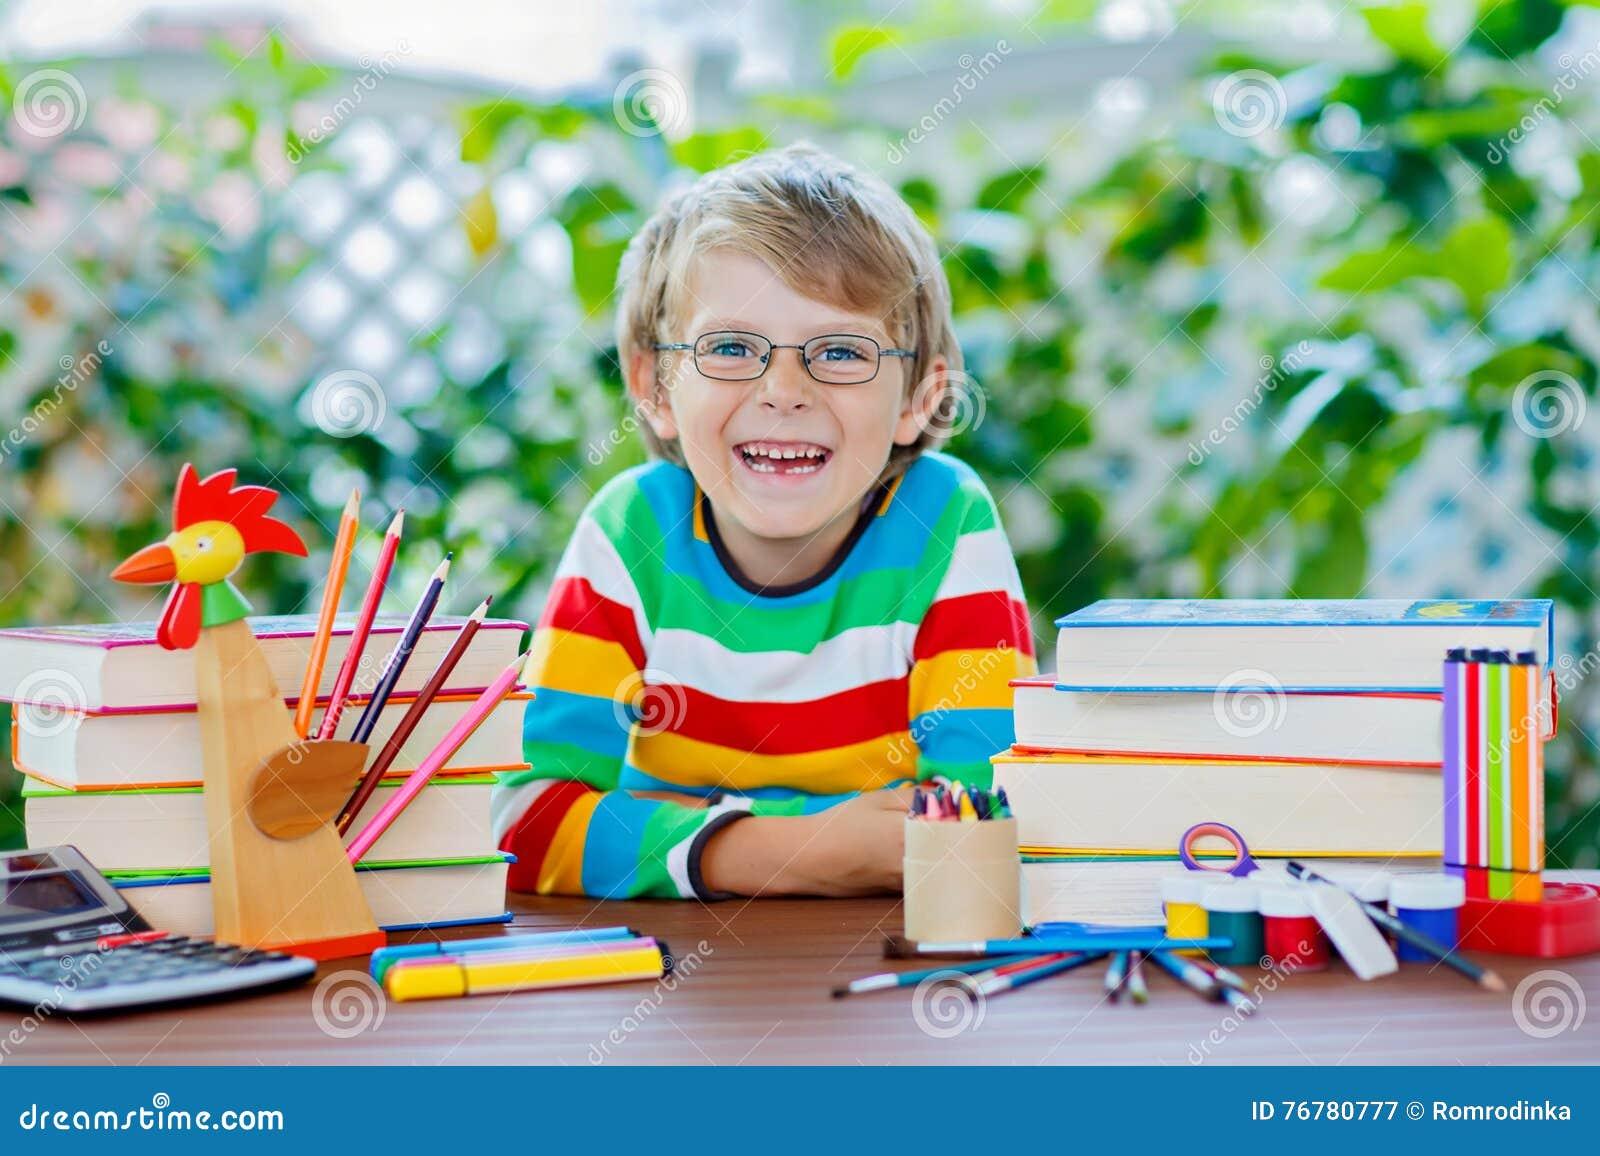 5f25ec23df86 Happy School Kid Boy With Glasses And Student Stuff Stock Image ...